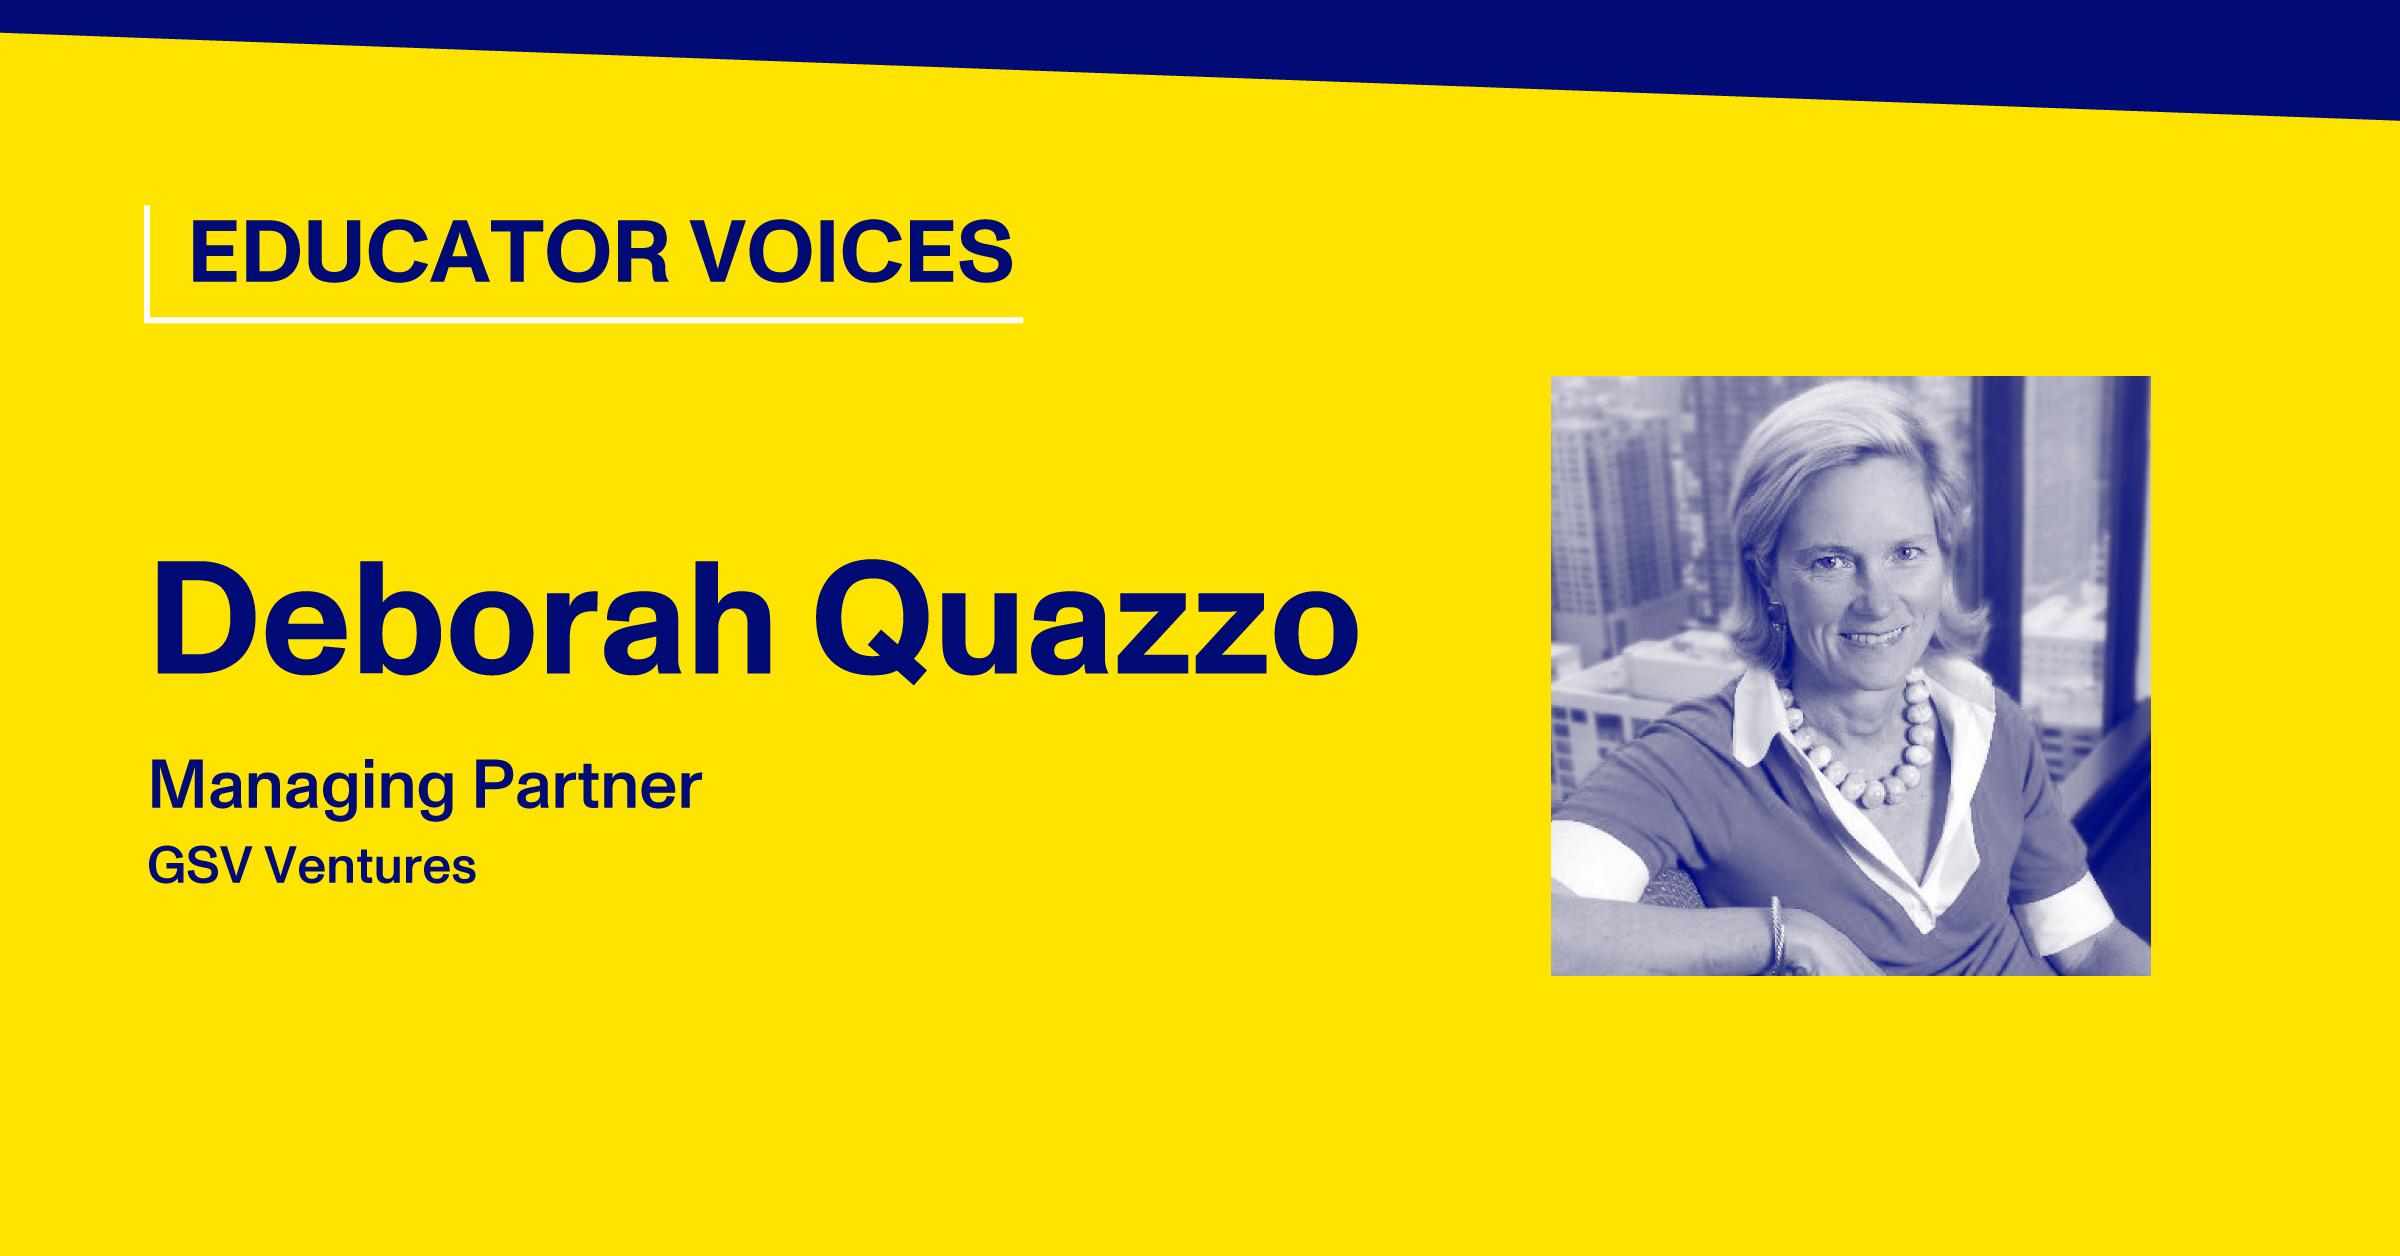 Blog Thumbnail with Headshot of Deborah Quazzo